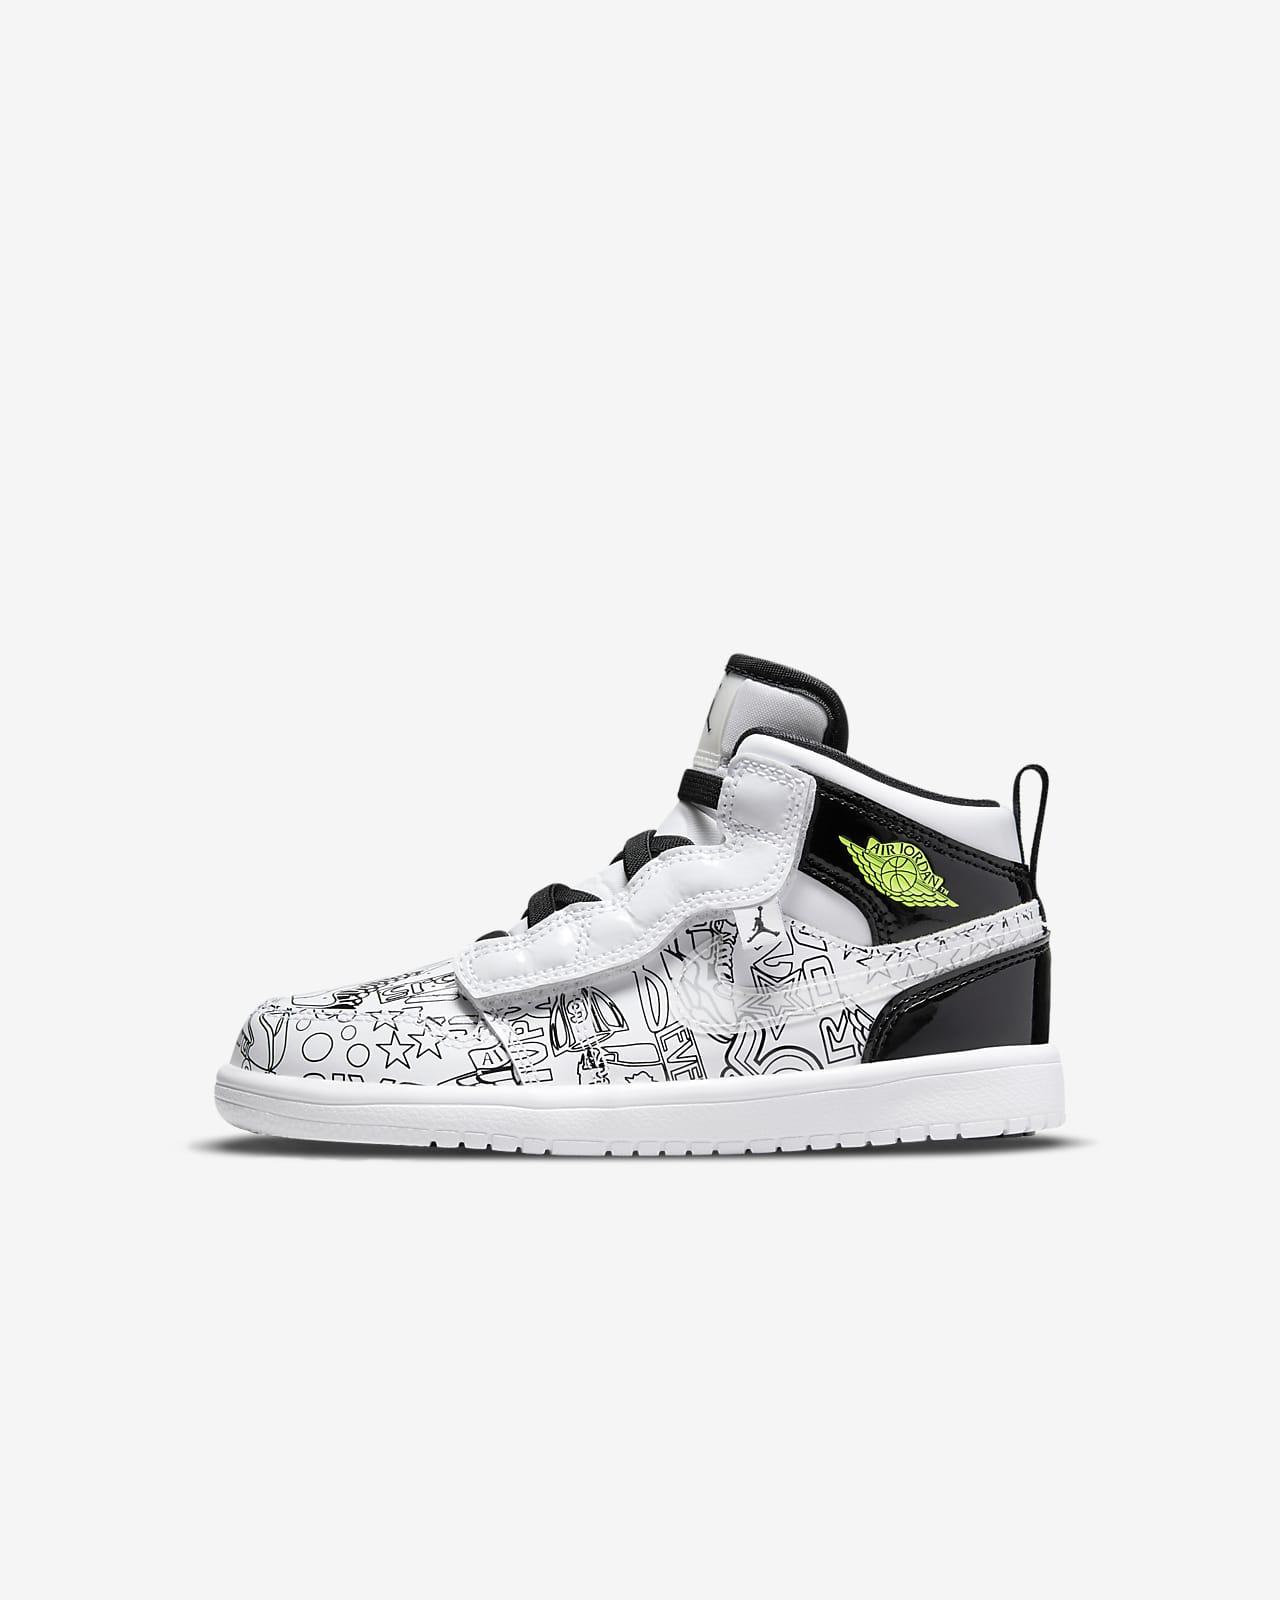 Jordan 1 Mid ALT SE (PS) 幼童运动童鞋